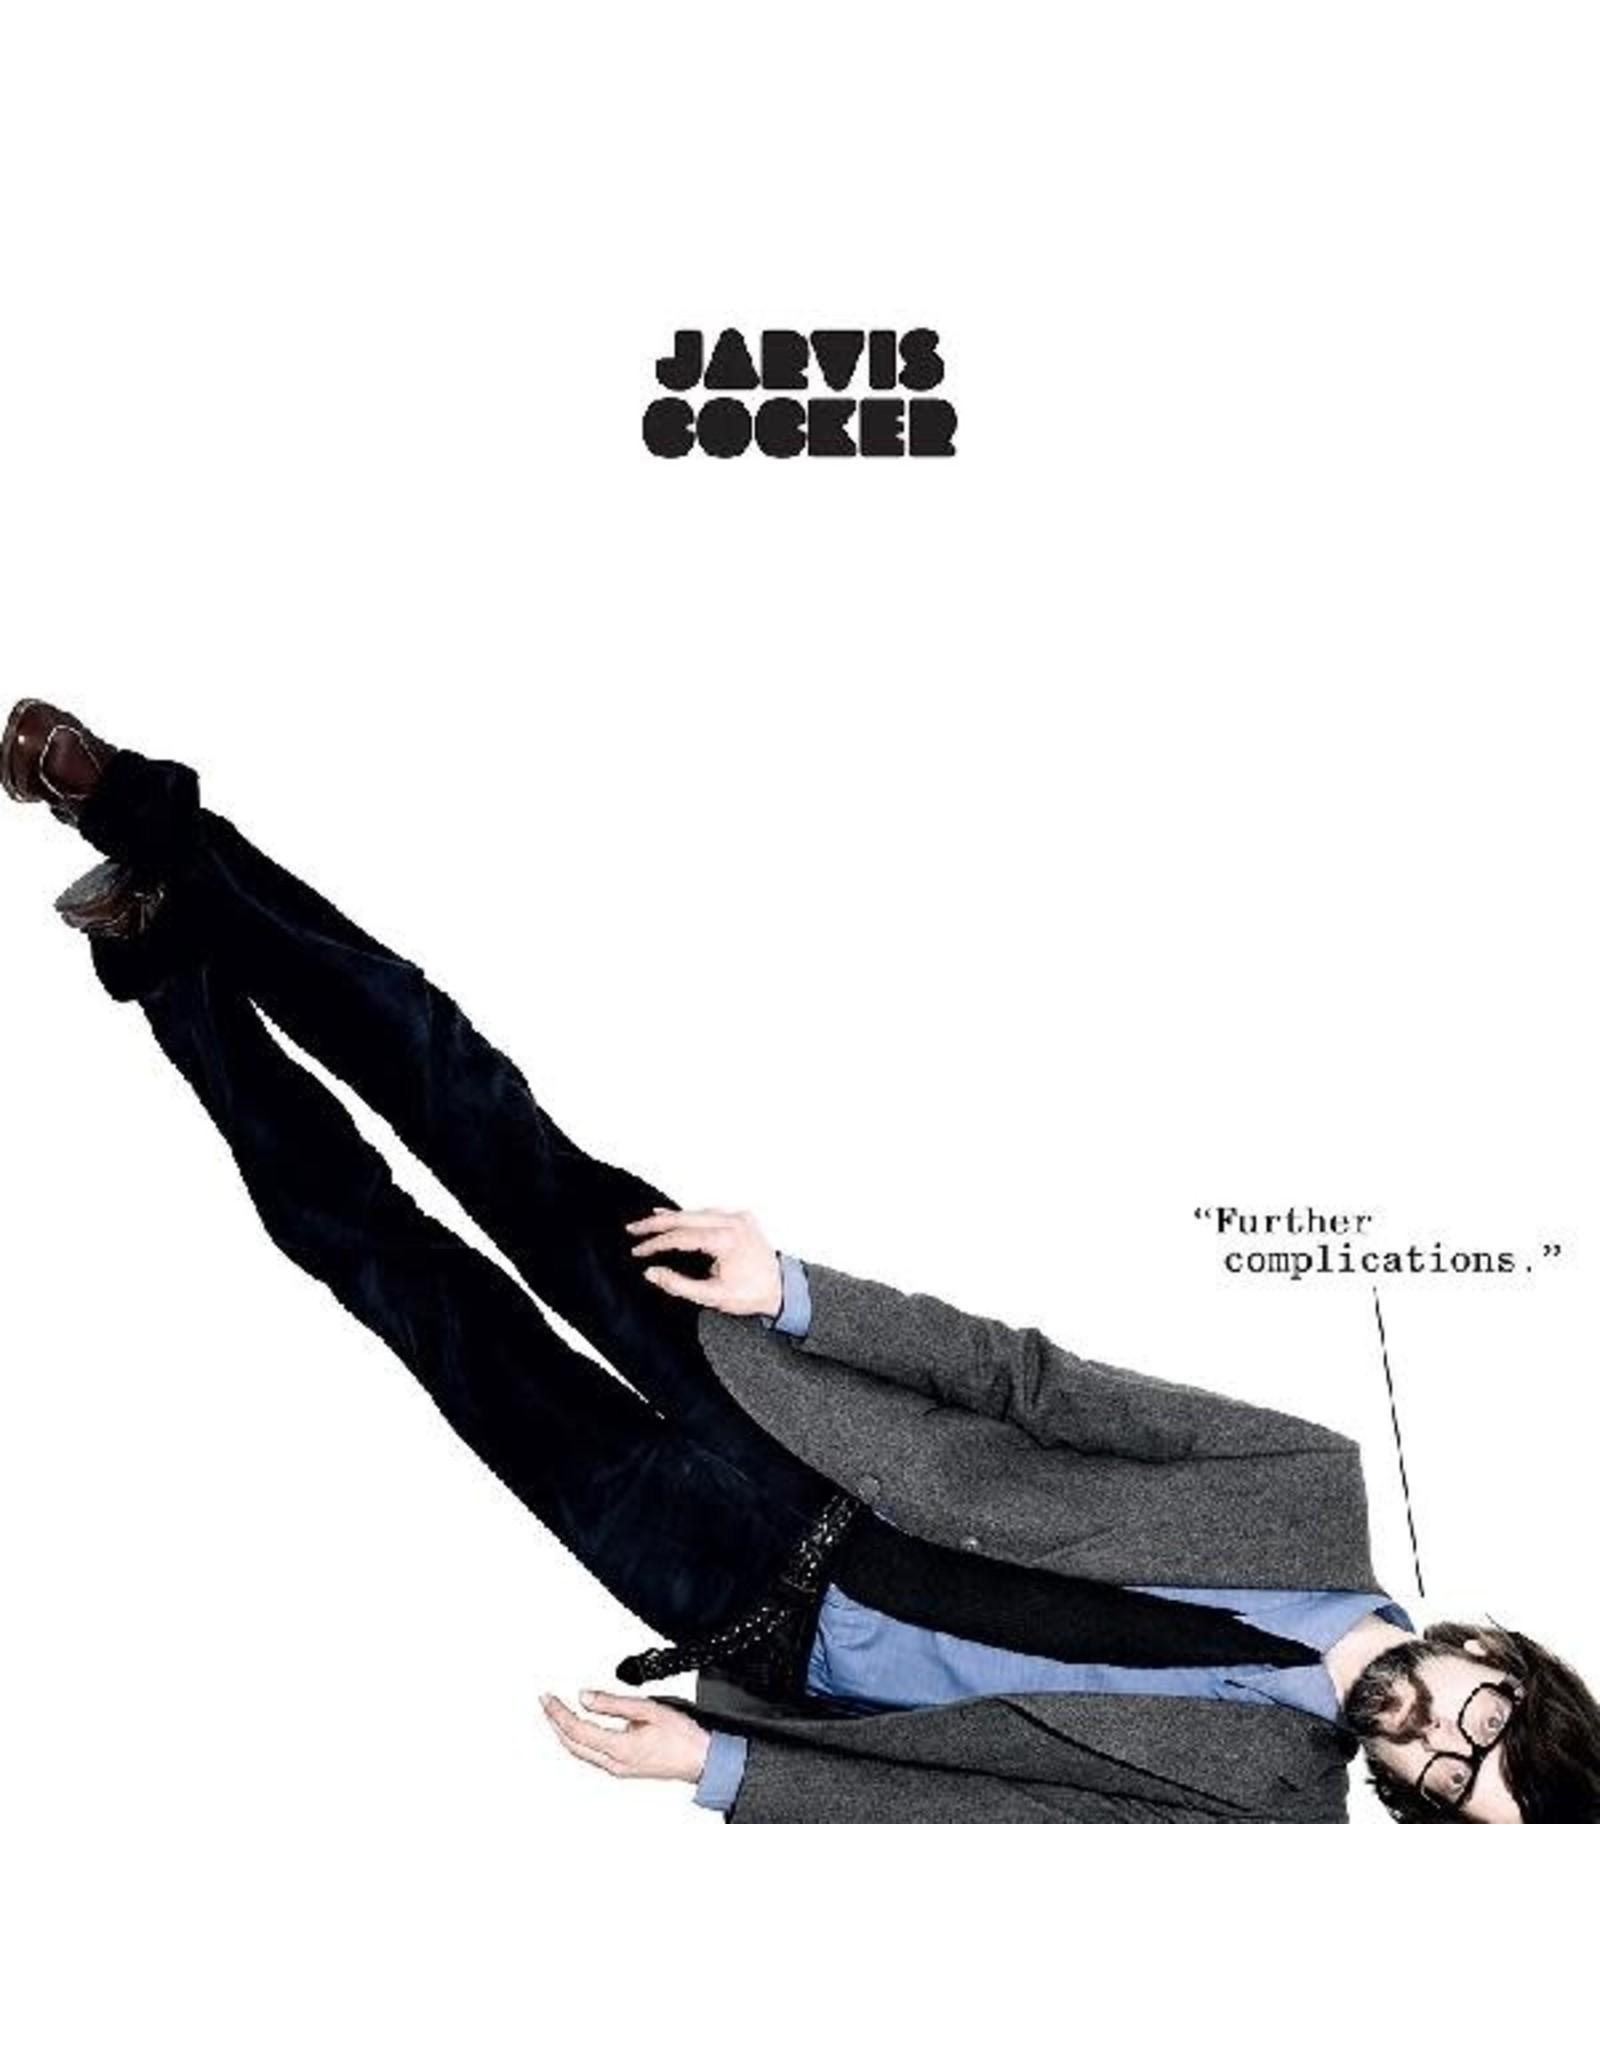 New Vinyl Jarvis Cocker - Further Complications (2020 Remaster) 2LP